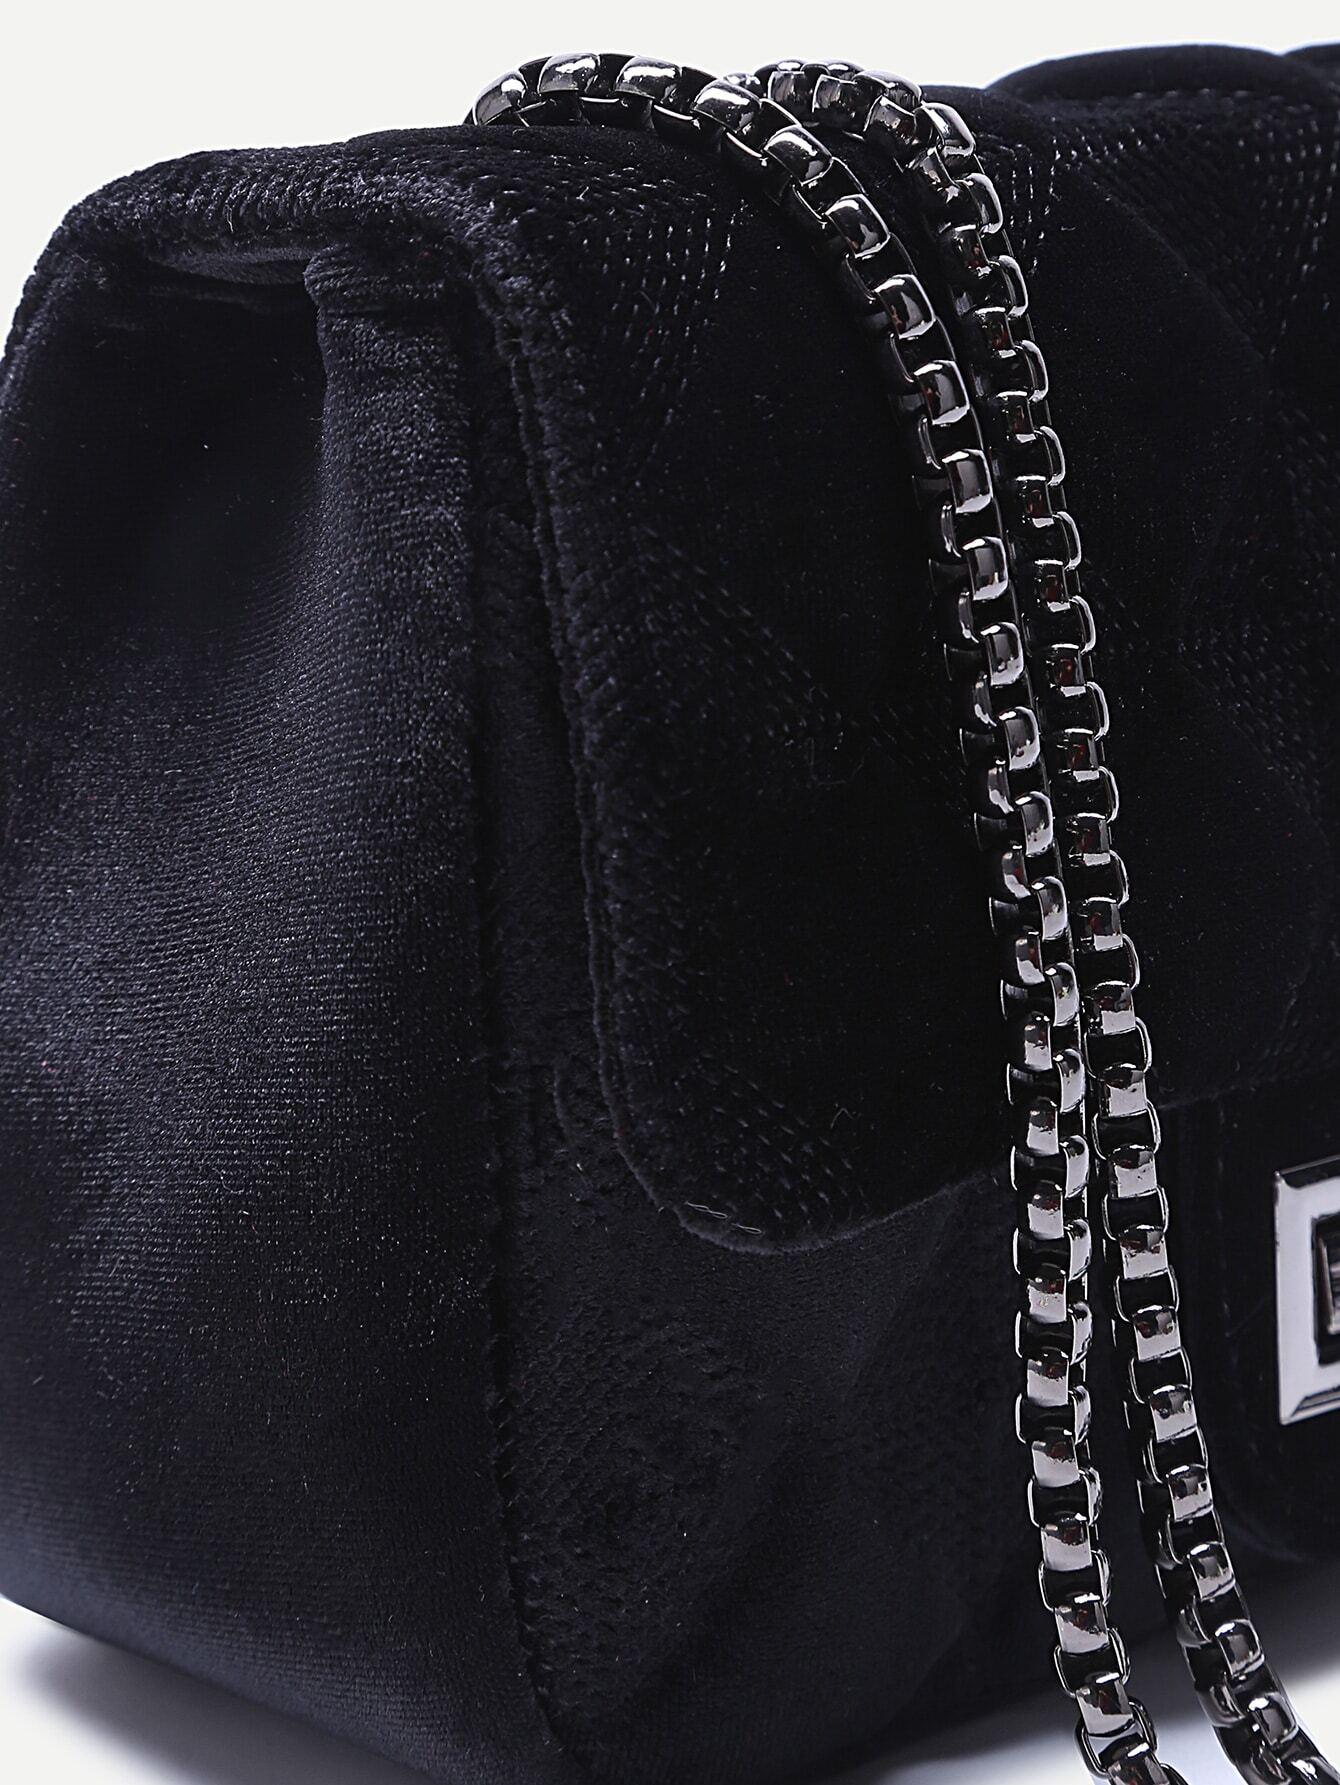 bag161109905_2